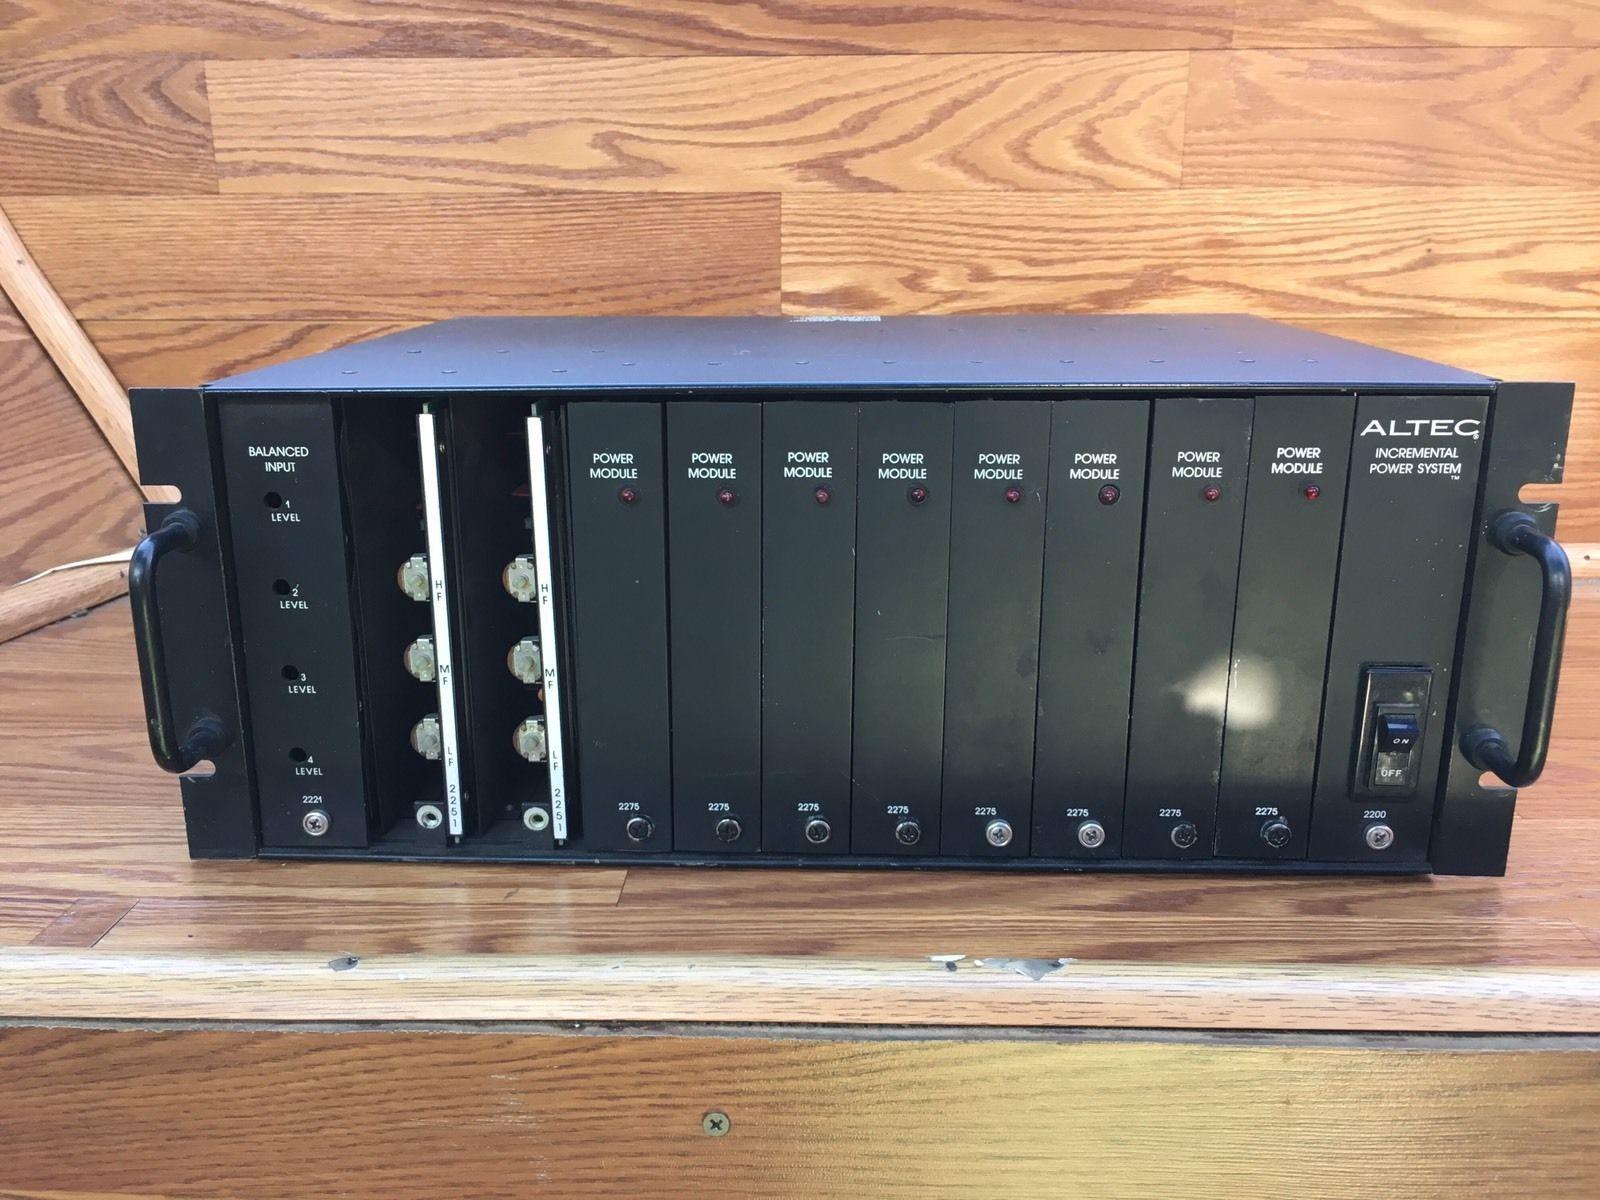 Altec Lansing 2220 Incremental Power System Mainframe Amplifier Amp 2275 Cards